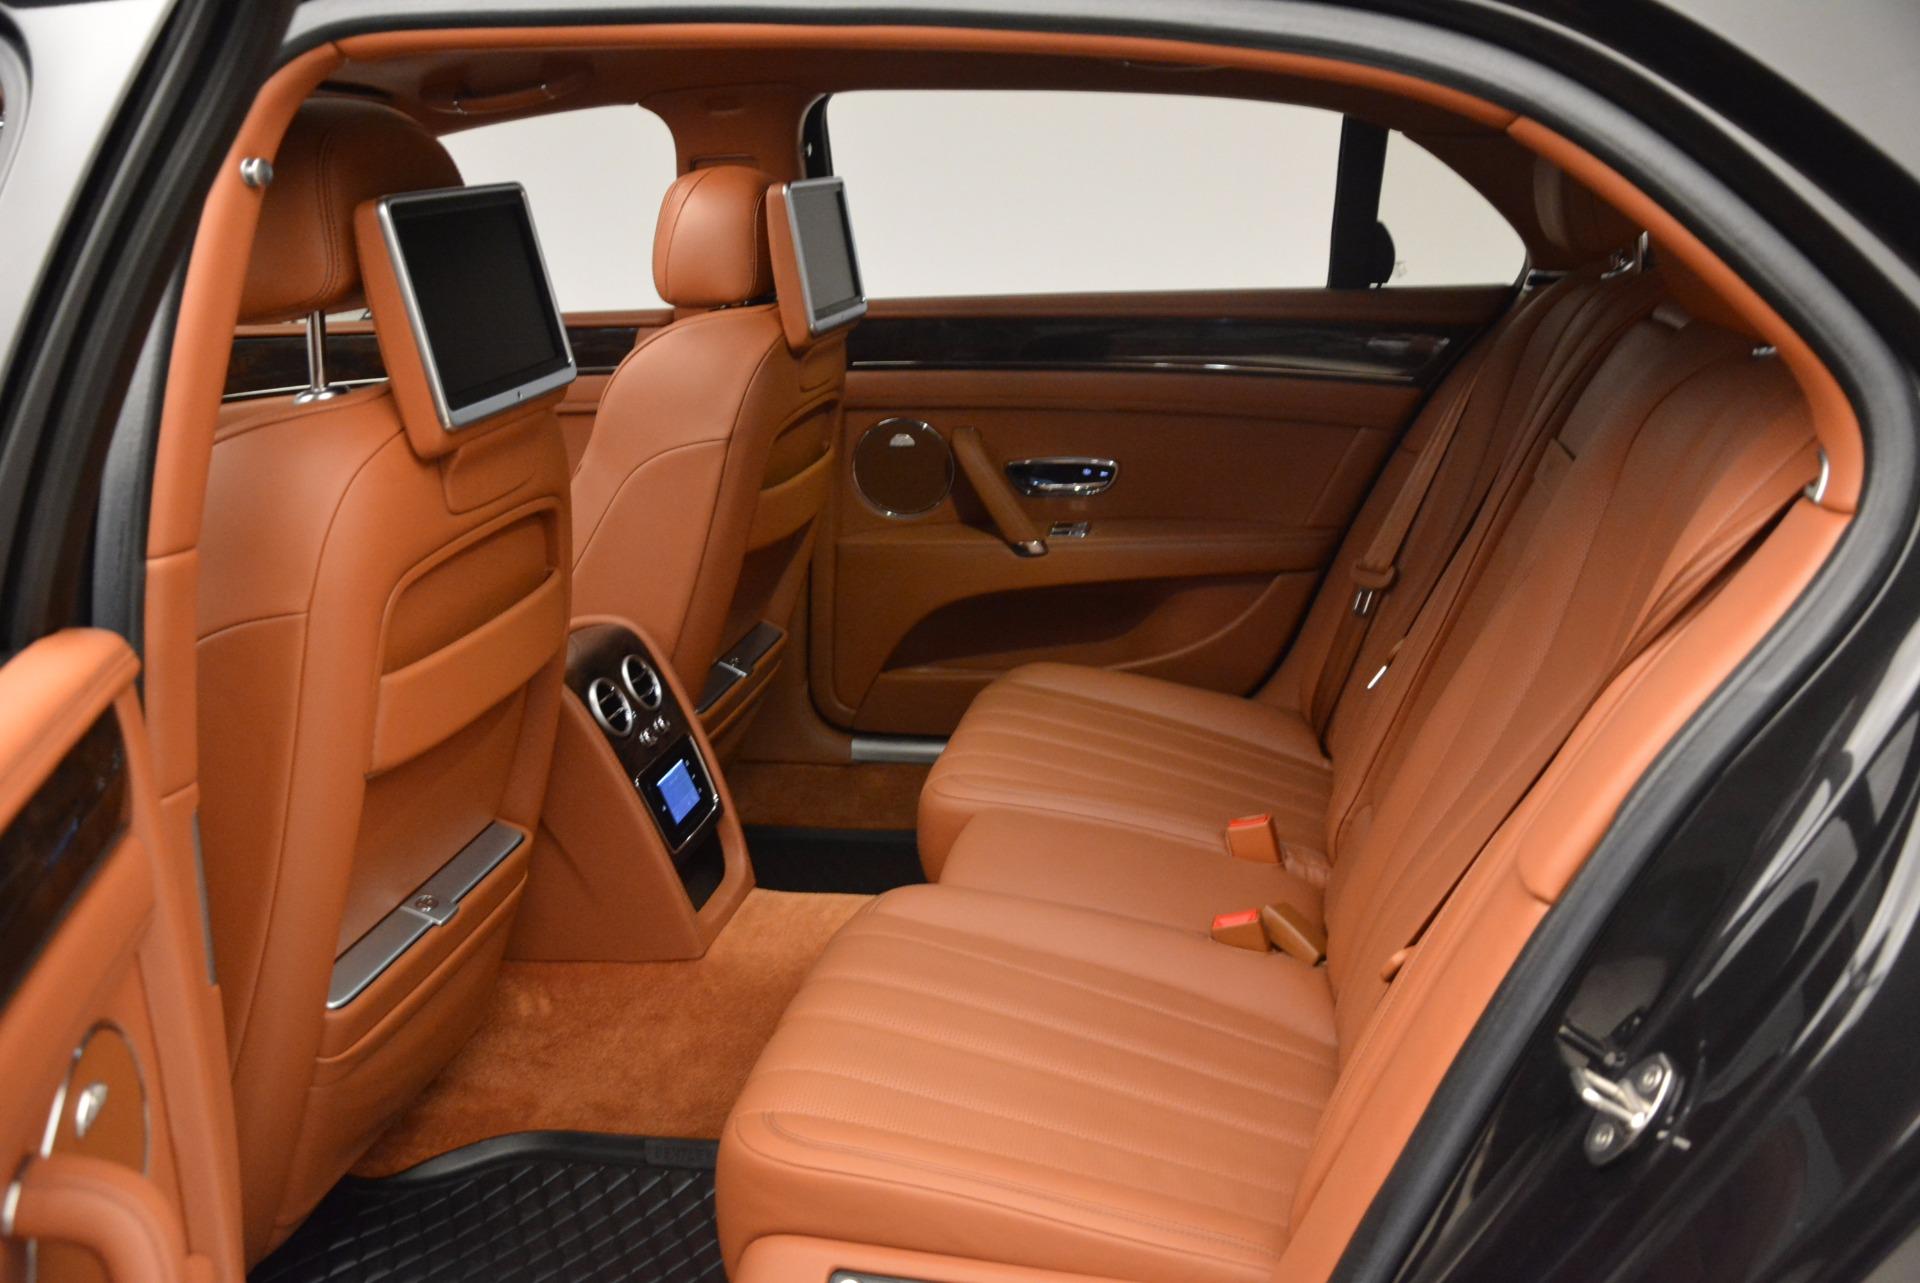 Used 2014 Bentley Flying Spur W12 For Sale In Westport, CT 1598_p33